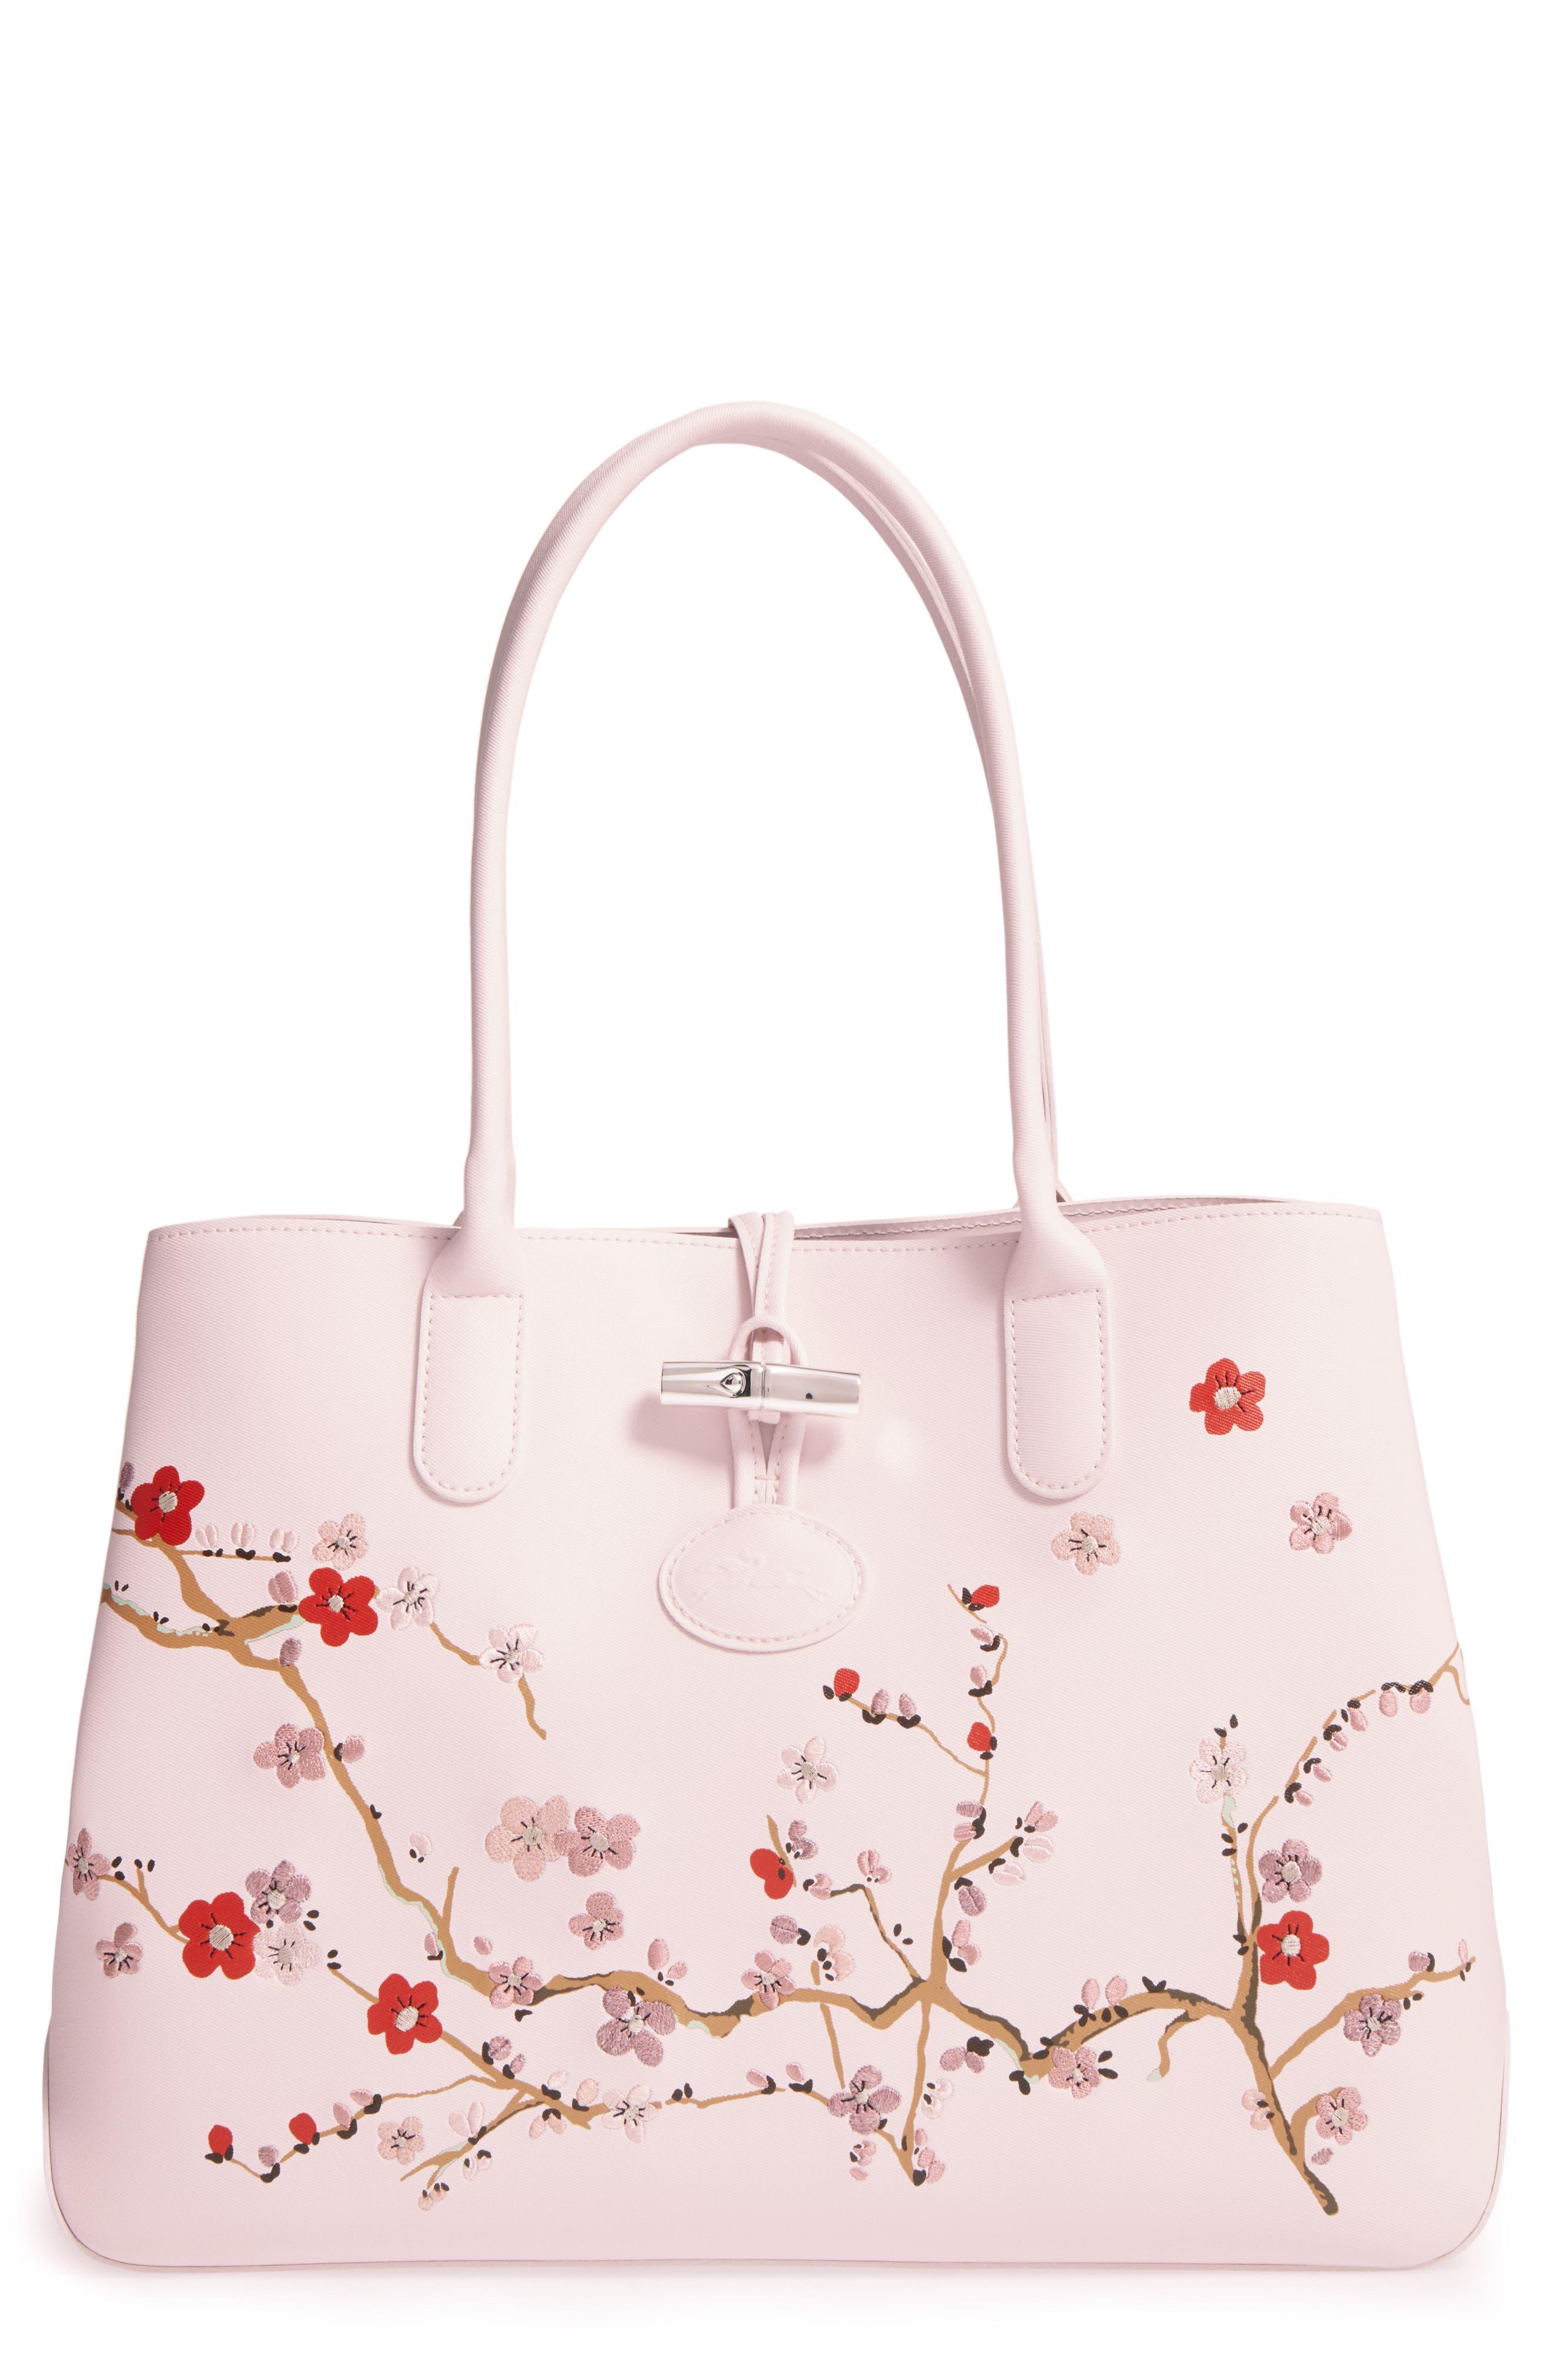 Alternate Image 1 Selected - Longchamp Roseau Sakura Embroidered Leather Shoulder Tote